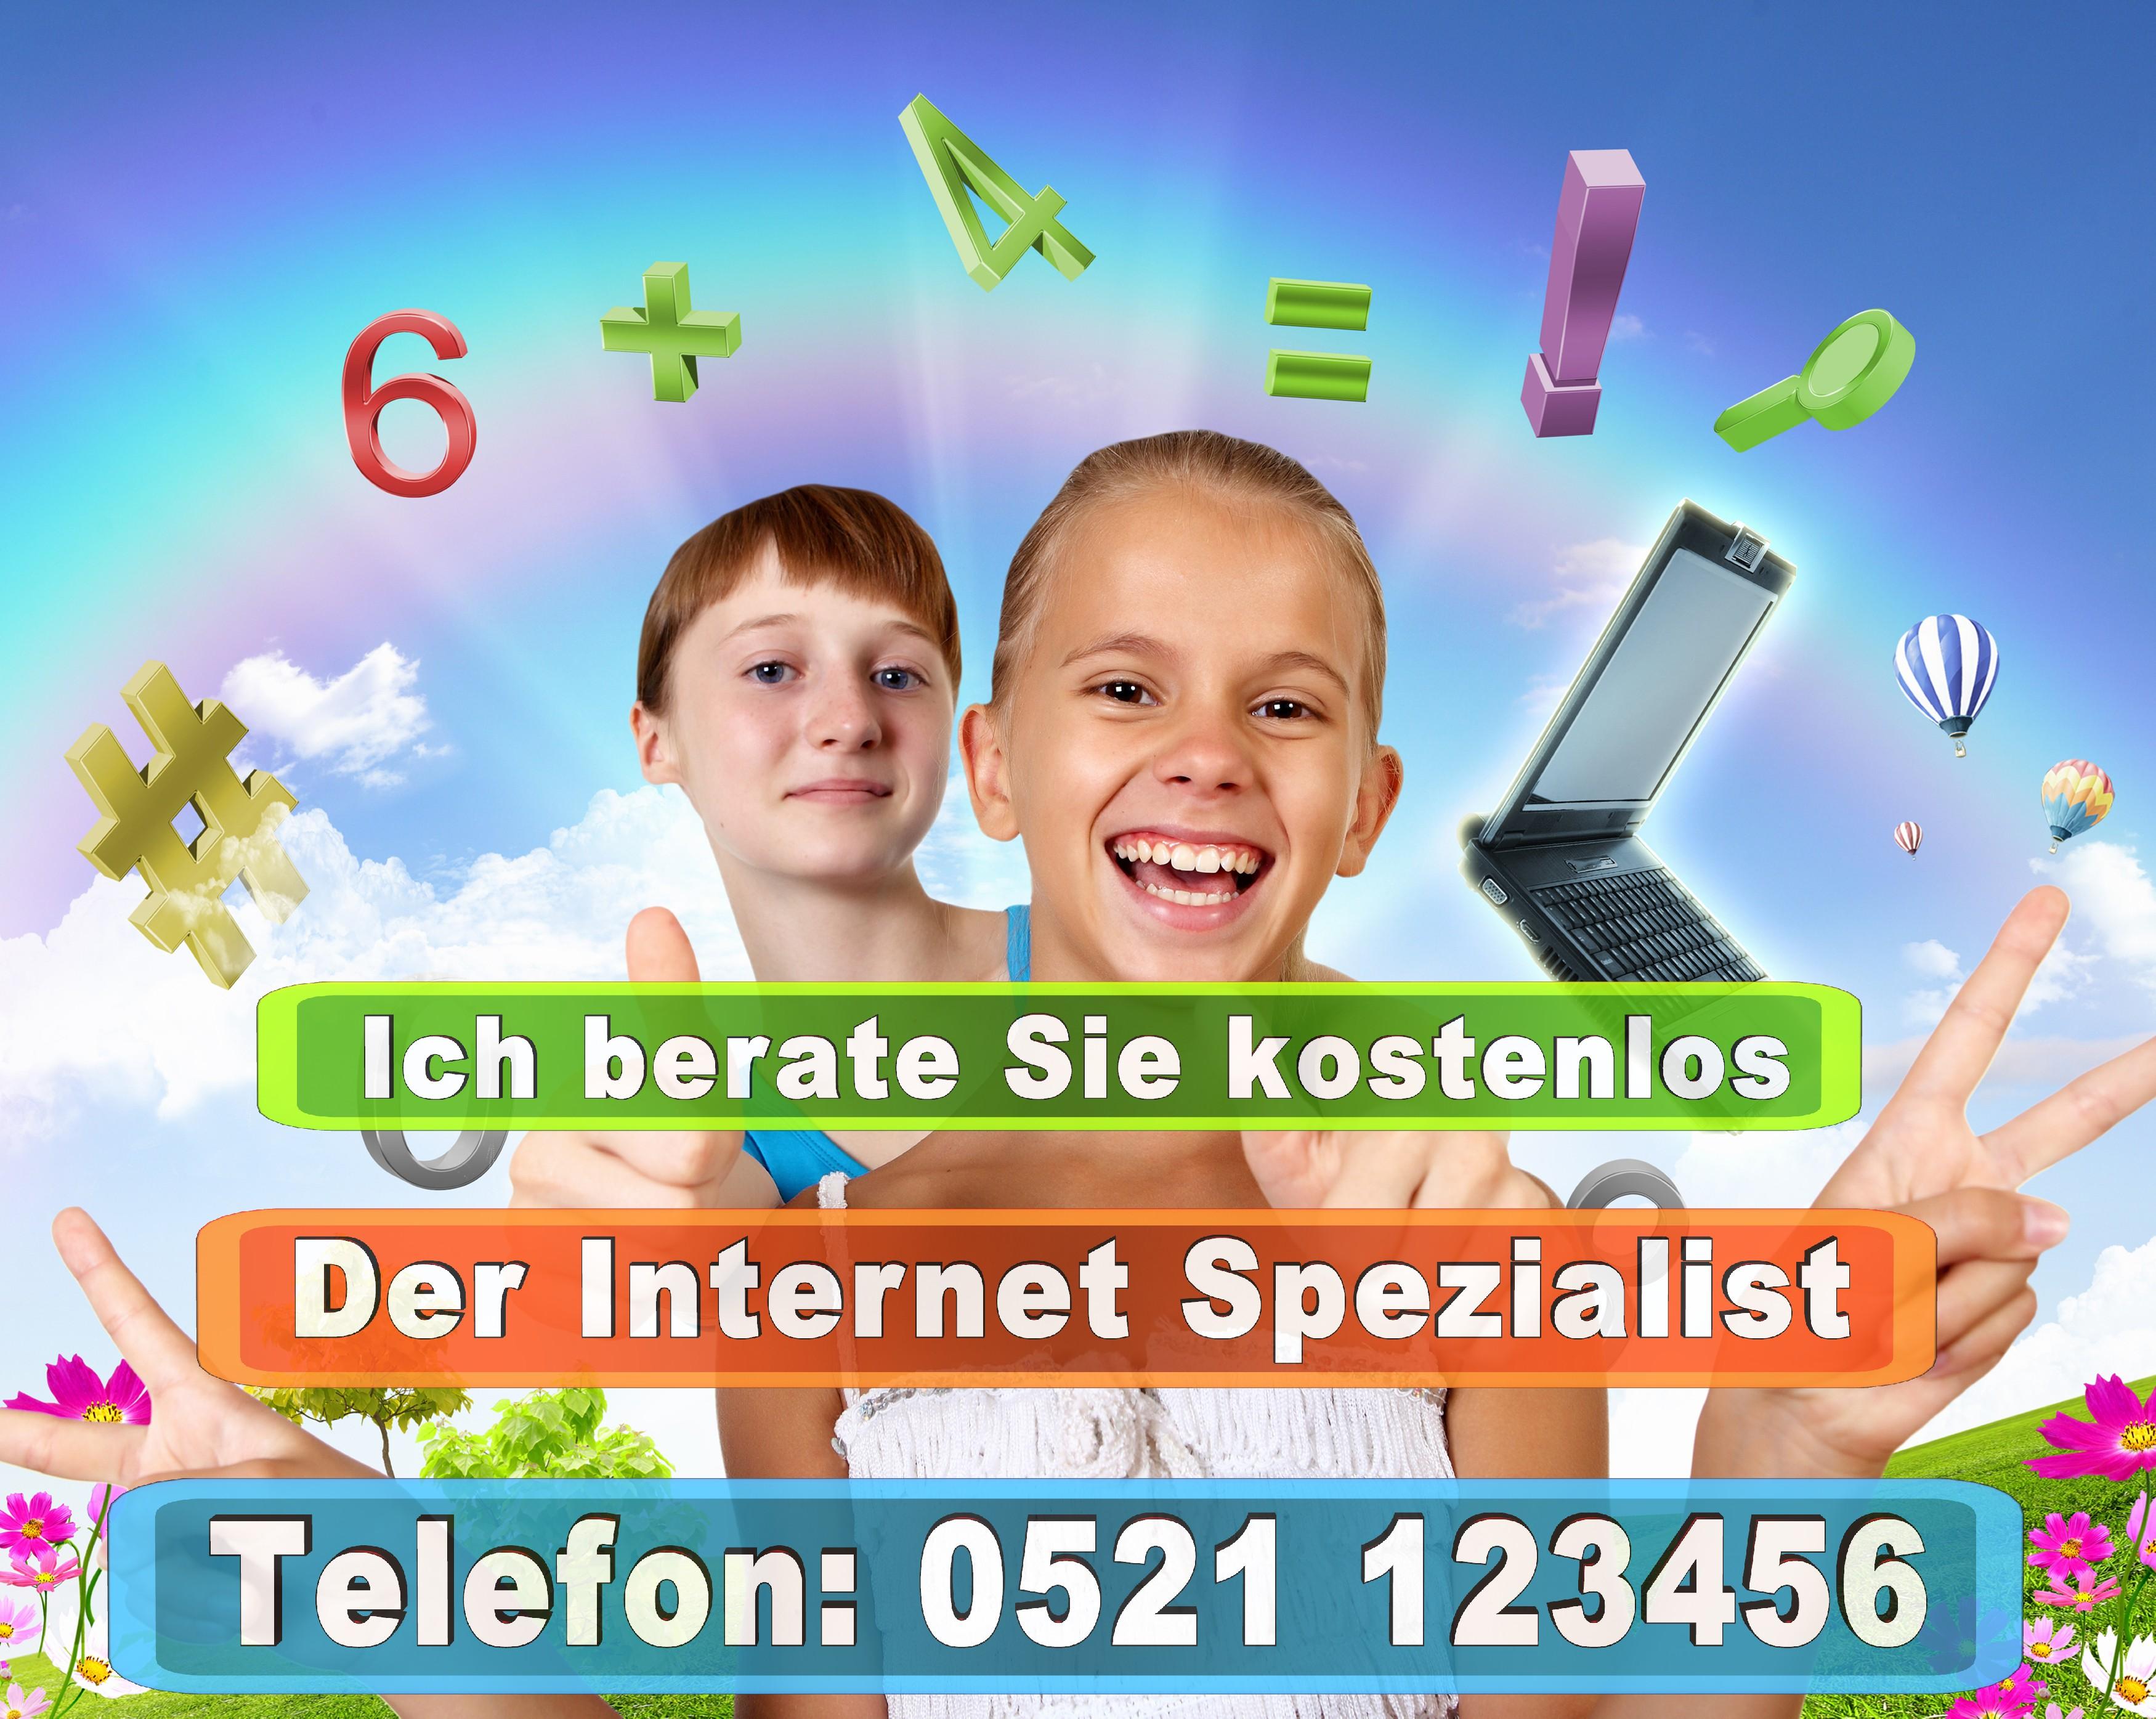 Schulen Bielefeld Schule Grundschule Sonderschule Hauptschule Realschule Schulhof Turnhalle Sporthalle Bielefeld NRW (22)